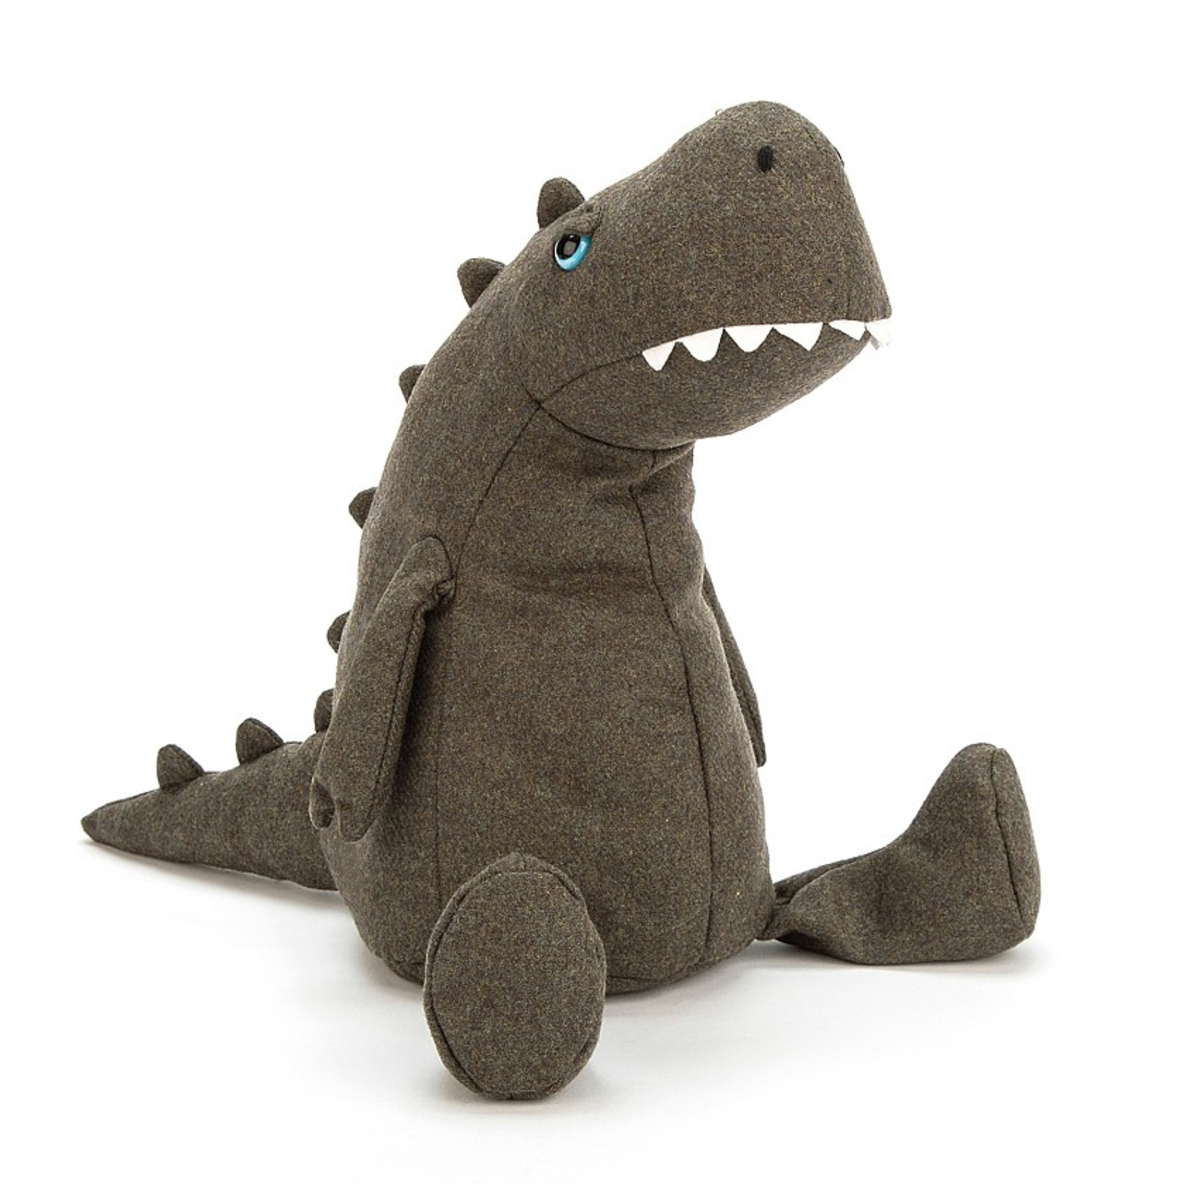 Peluche Peluche Pobblewob Dino 36 cm Peluche Pobblewob Dino 36 cm